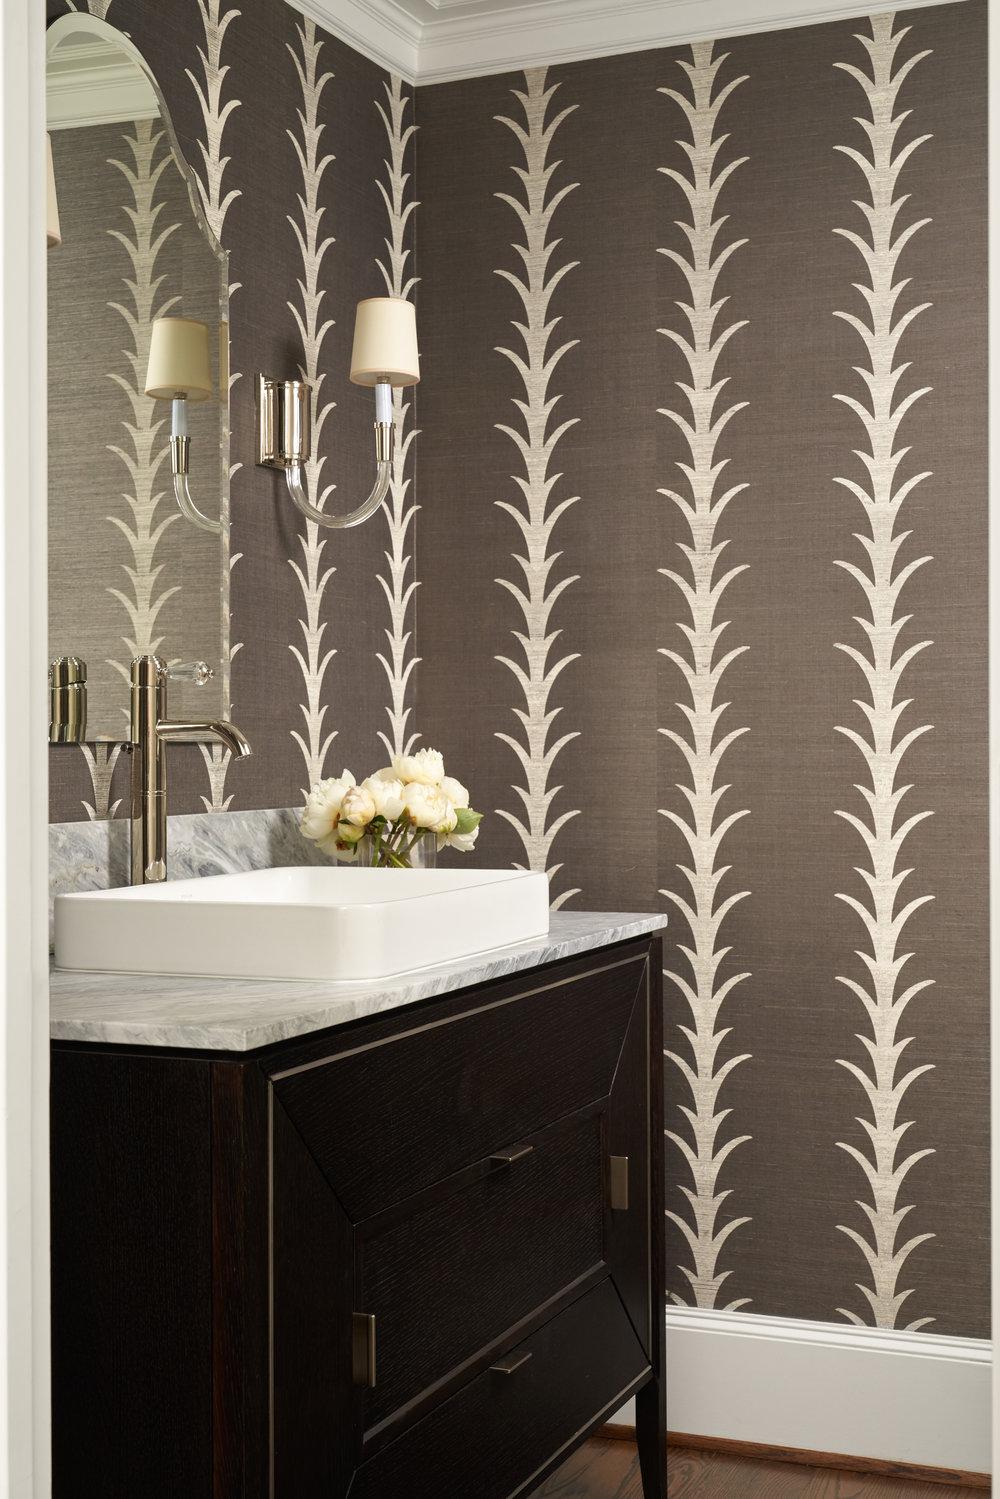 Powder room interior by Beth Lindsey Interior Design.